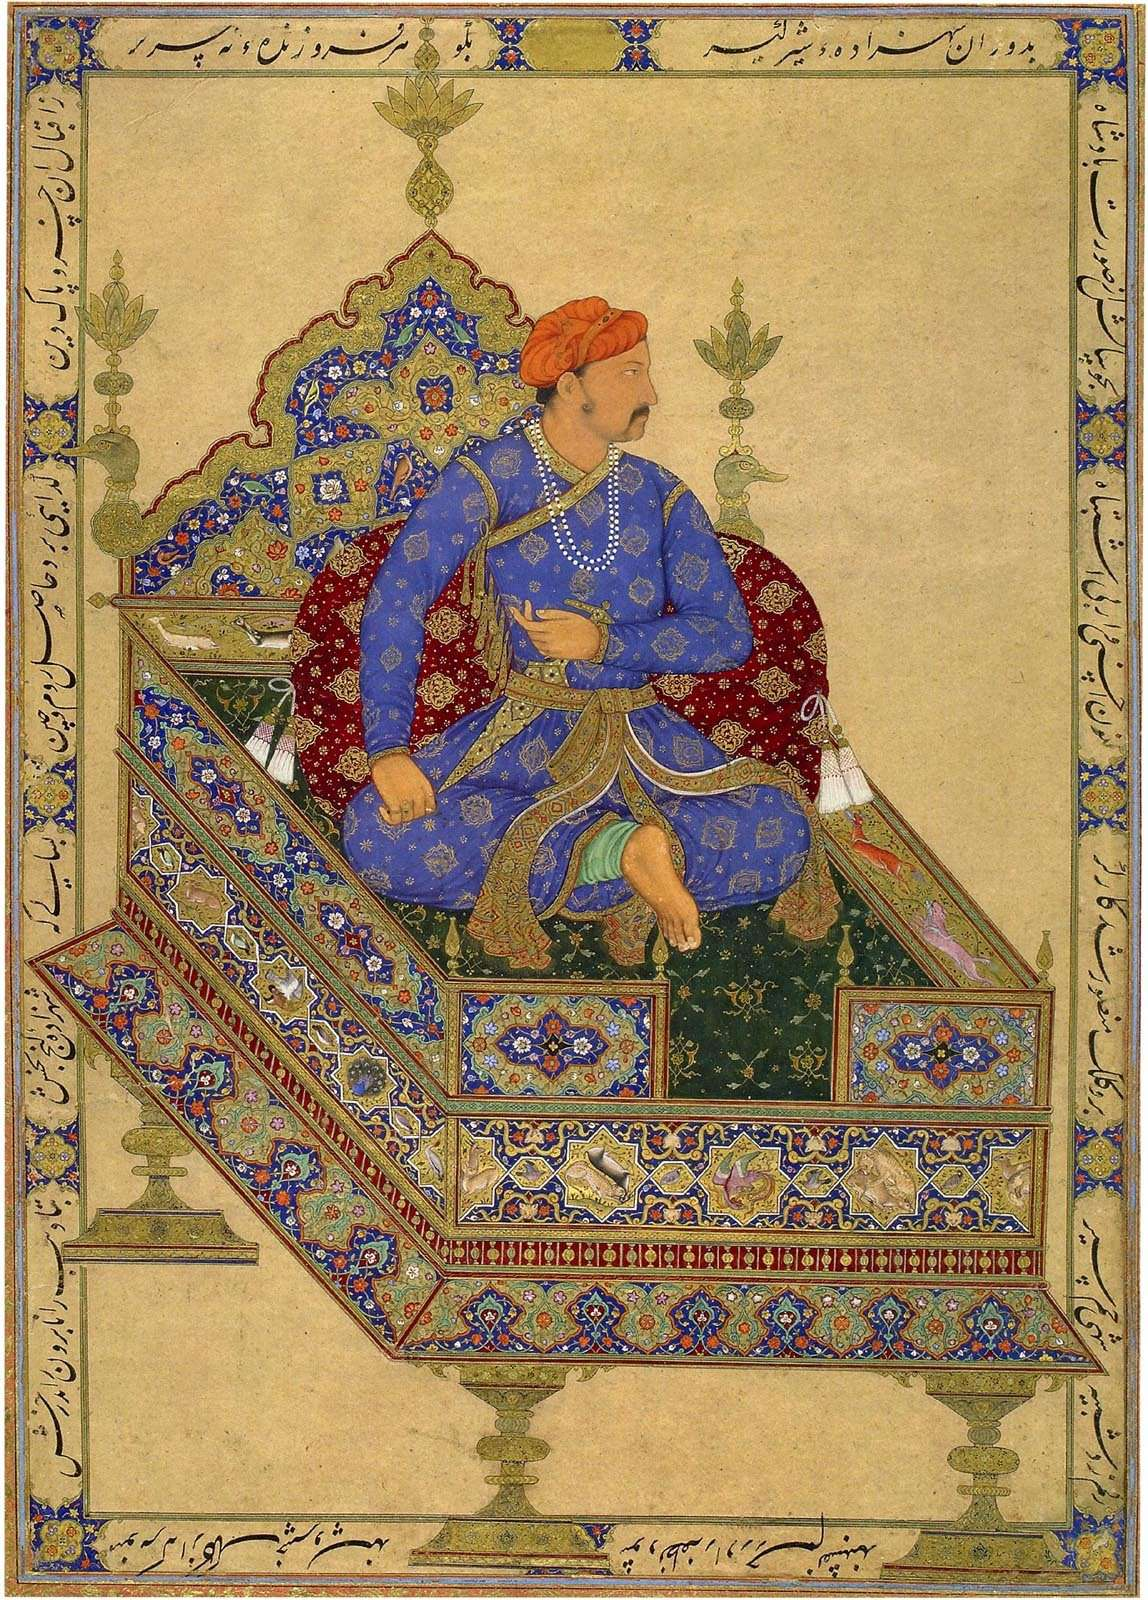 relationship between mariam uz zamani and salim nourallah